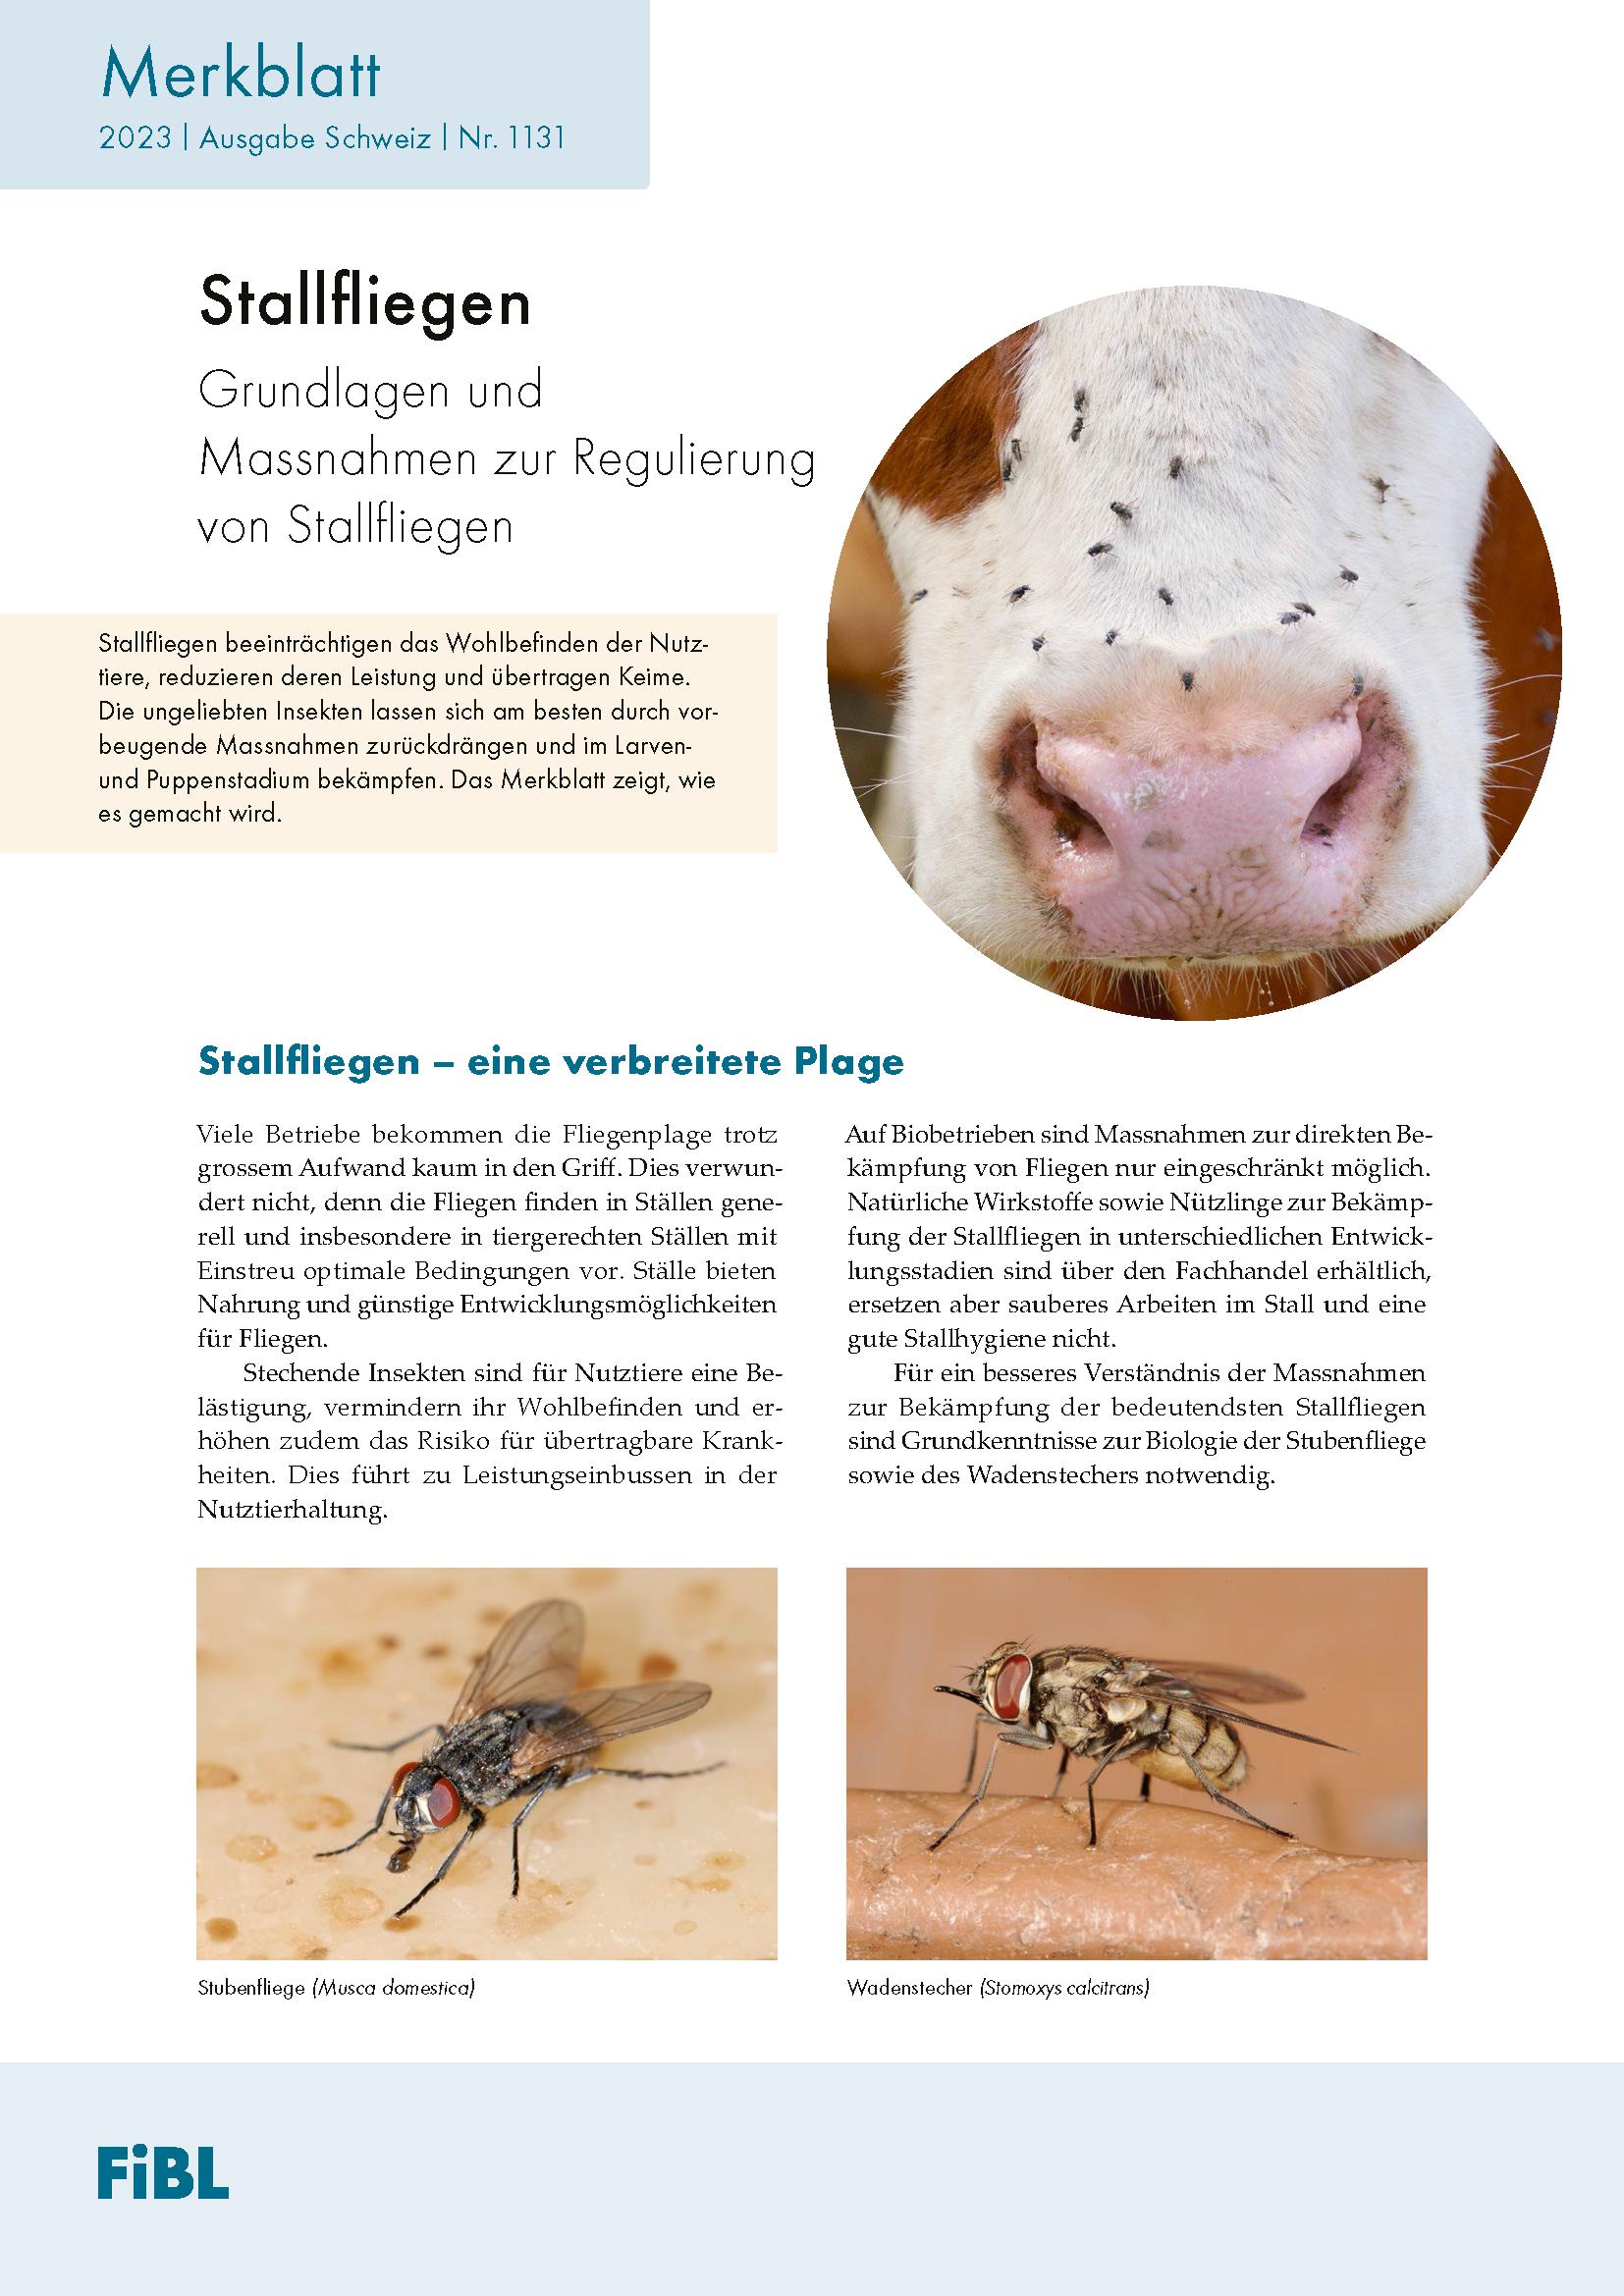 Regulierung der Stallfliegen